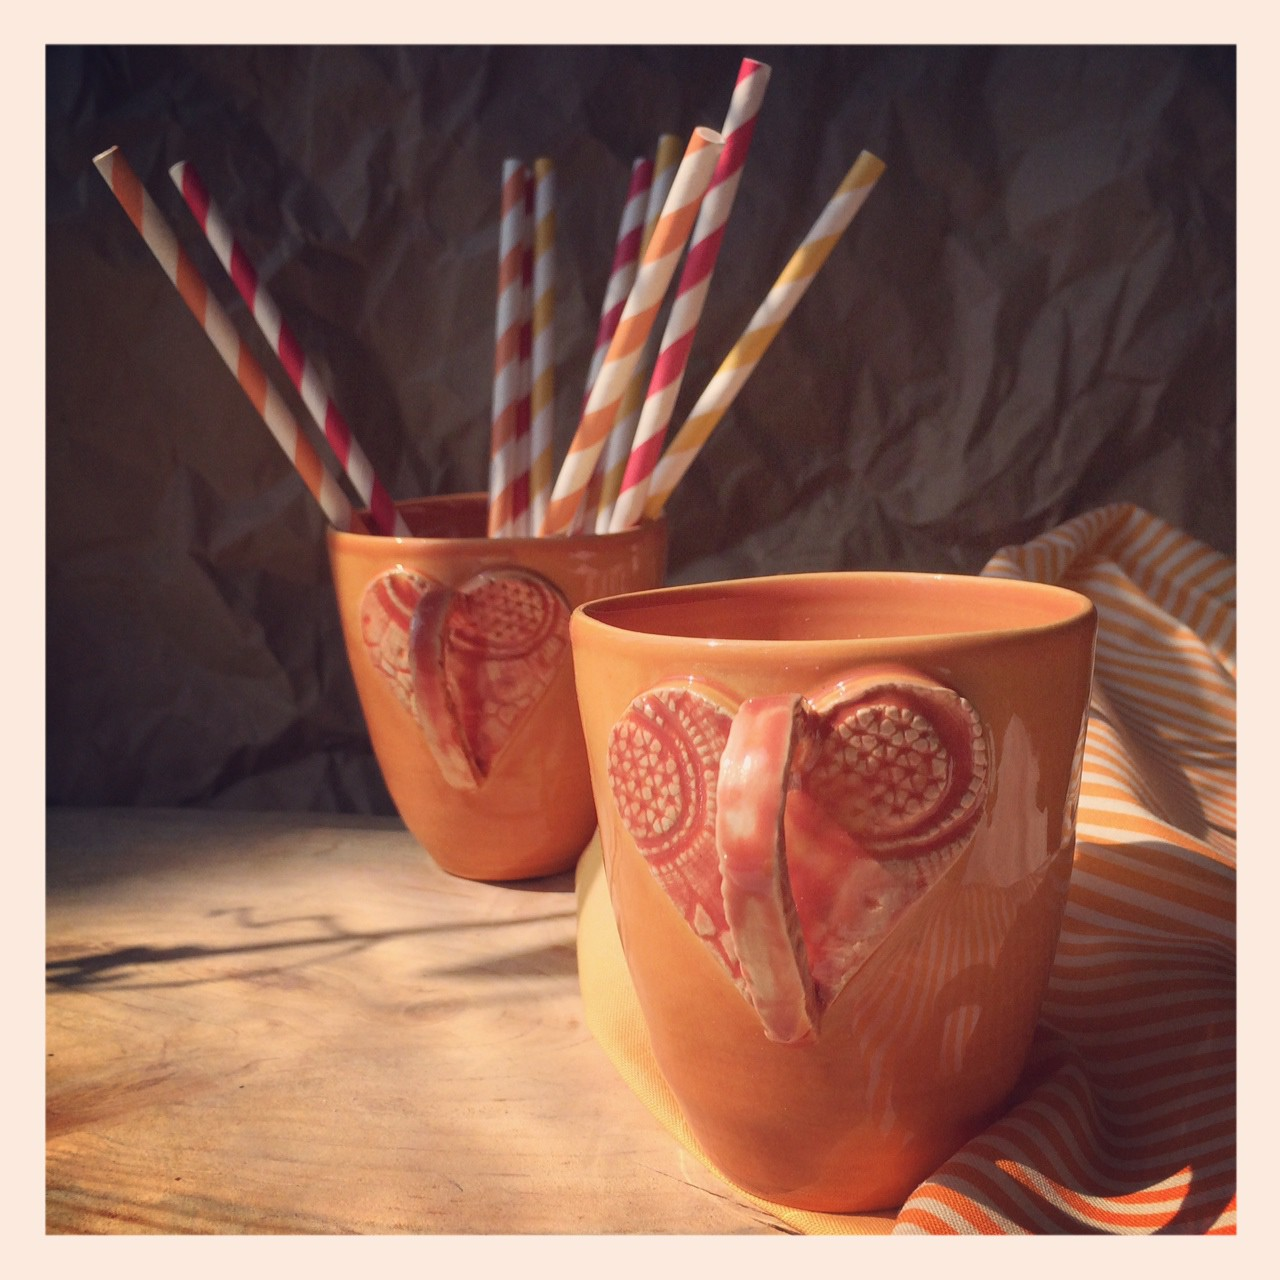 картинка Чашка с кружевным сердцем - DishWishes.Ru